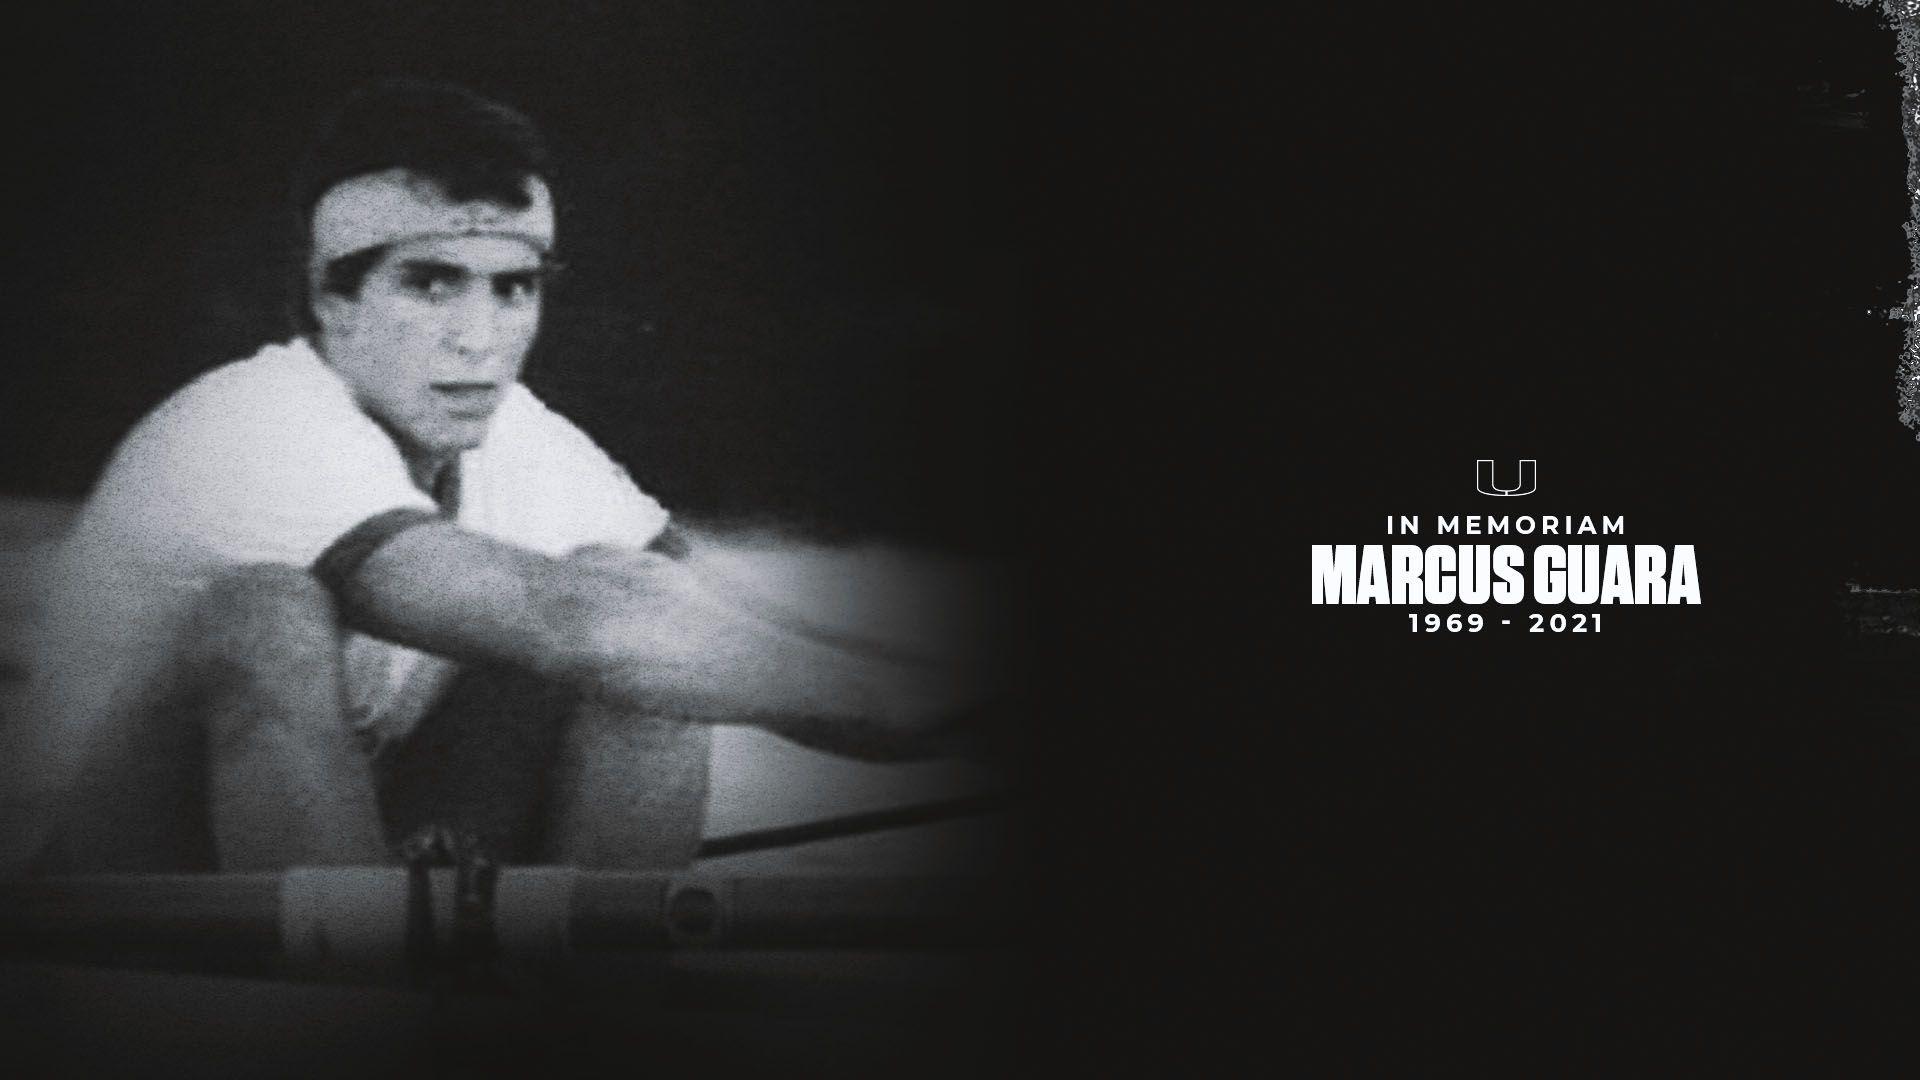 Former Teammates Honor Marcus Guara